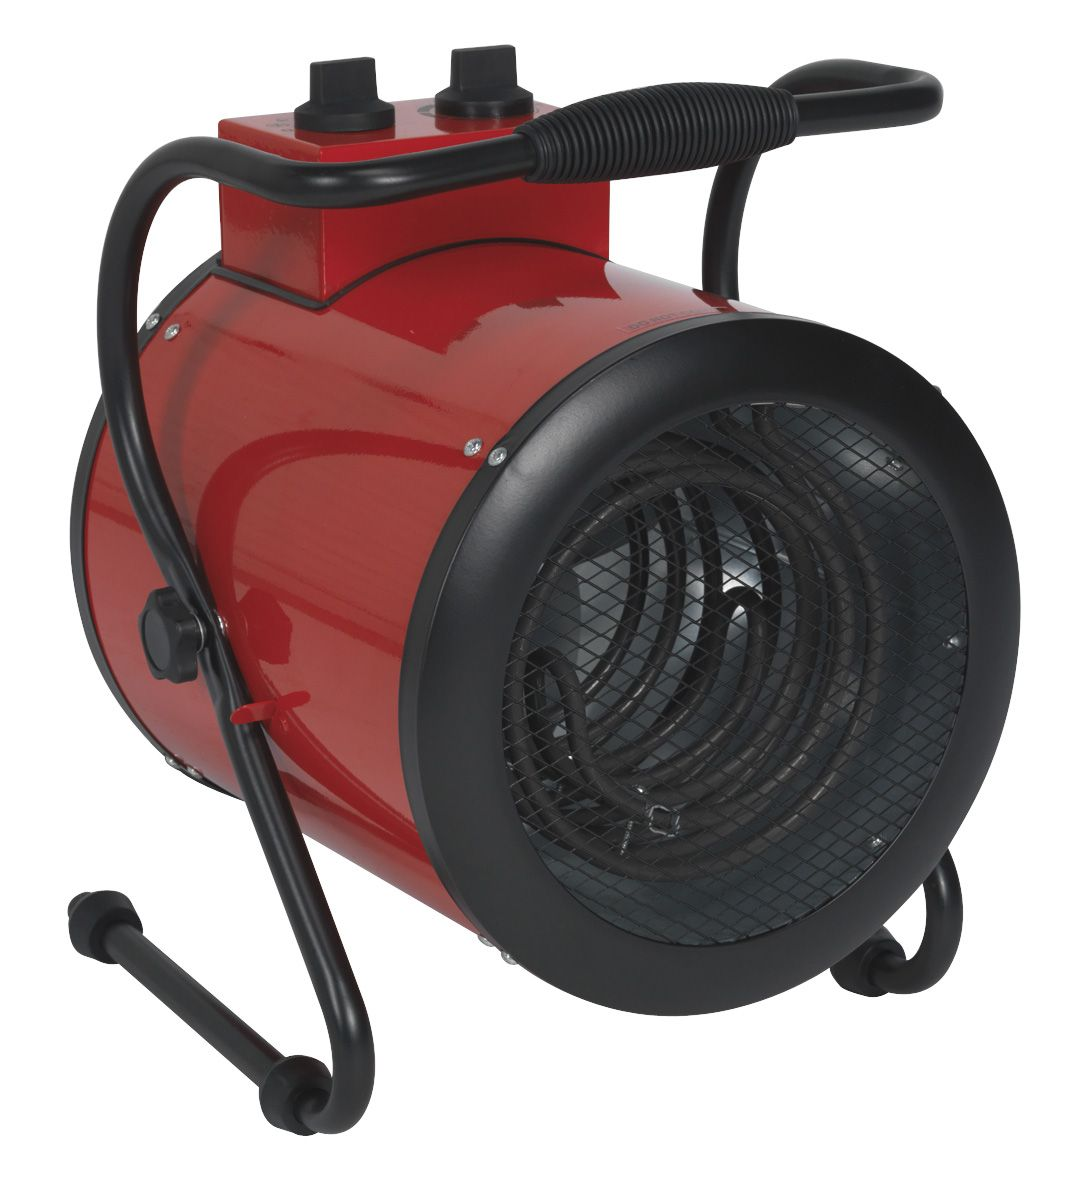 Sealey EH5001 Industrial 5kW Fan Heater 415v 3 Phase